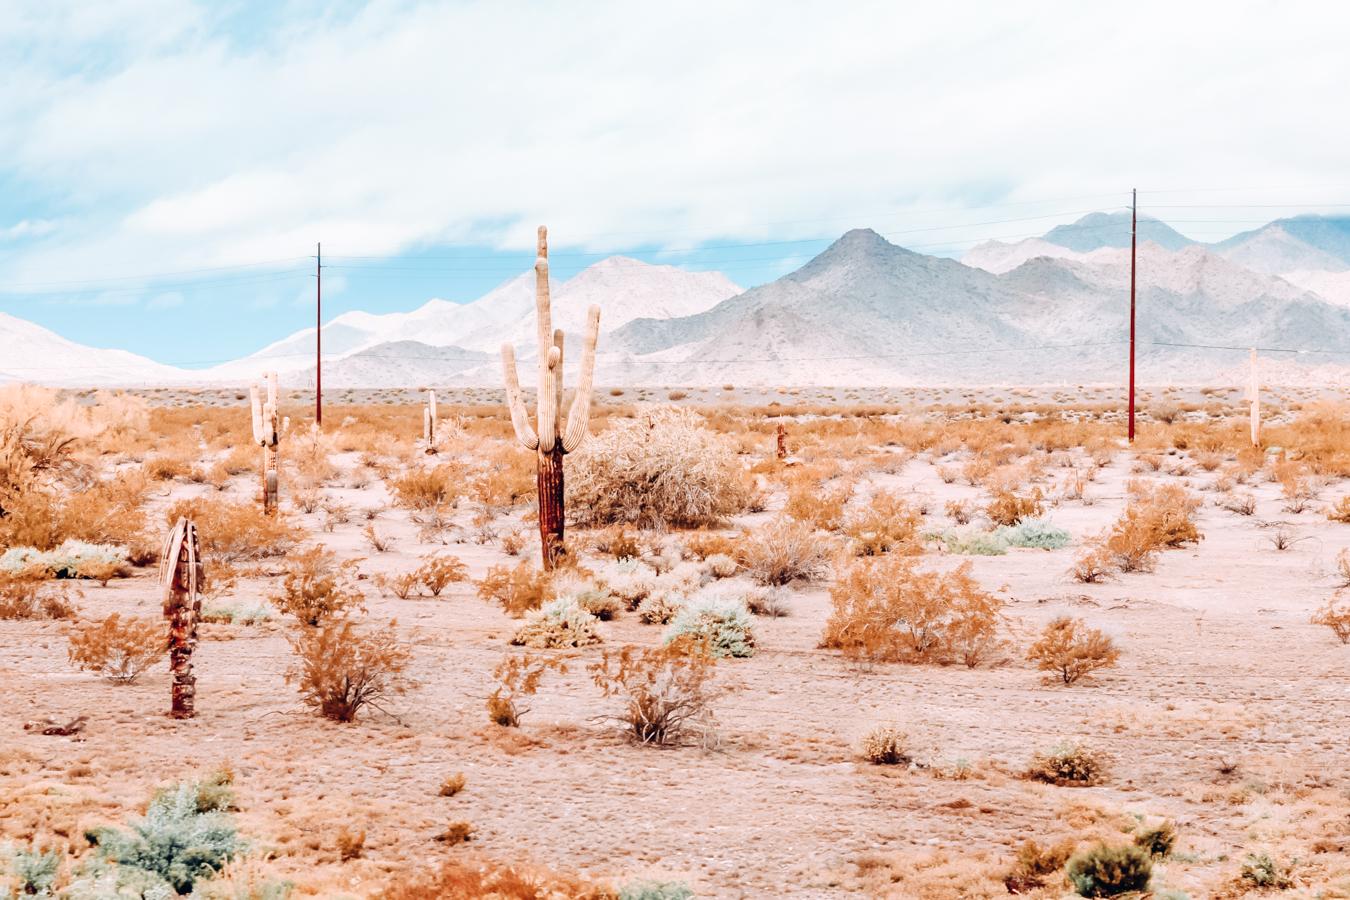 Nature in Arizona